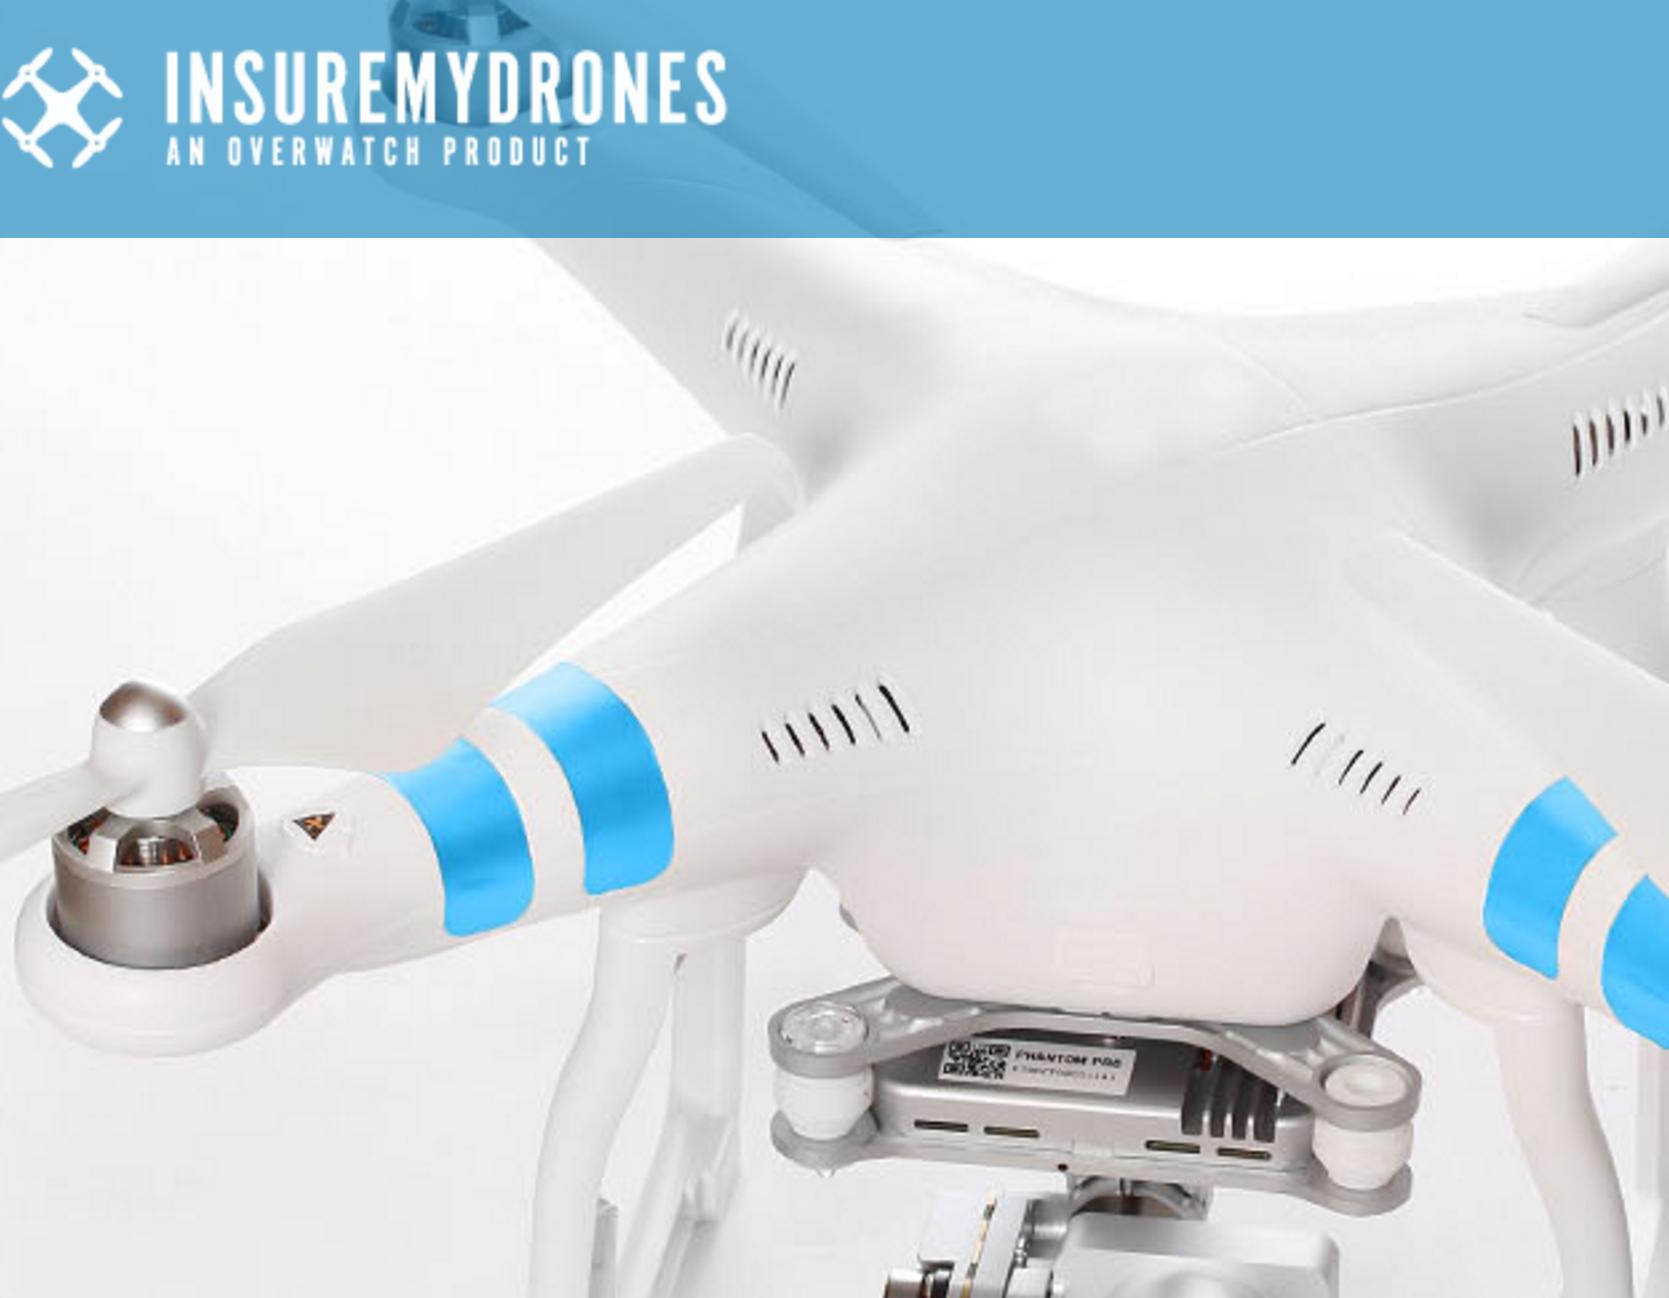 coverage drones